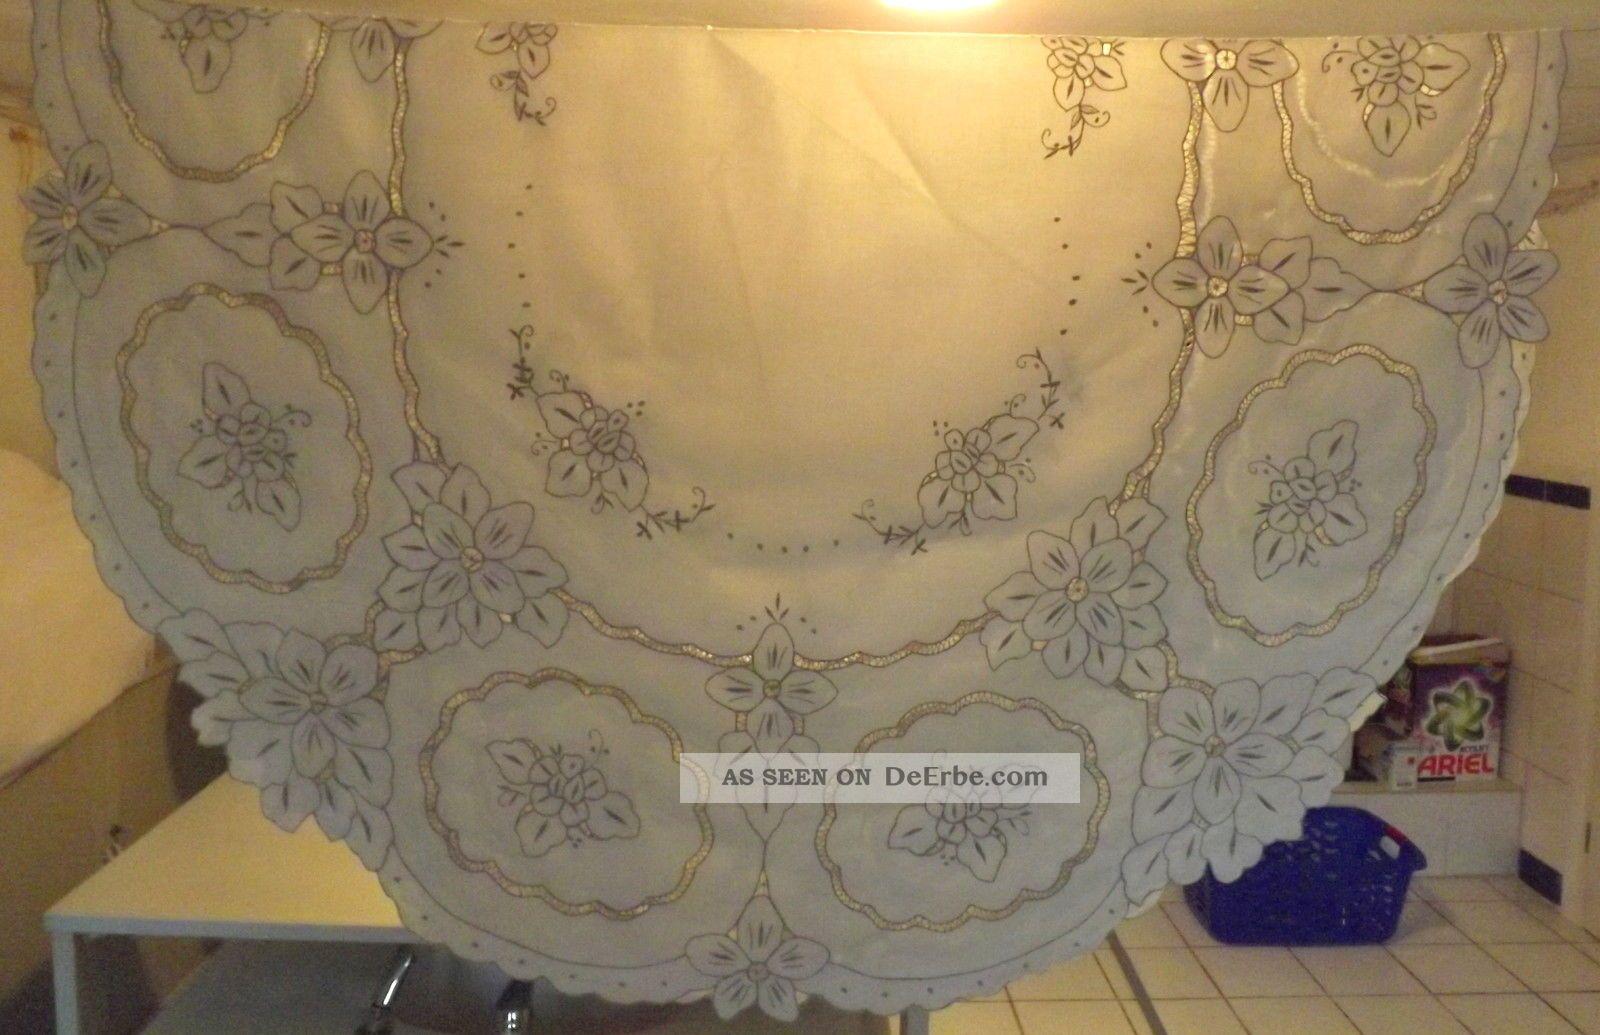 gro e alte tischdecke creme graue stickerei blumen richelieu oval 155 200 cm. Black Bedroom Furniture Sets. Home Design Ideas